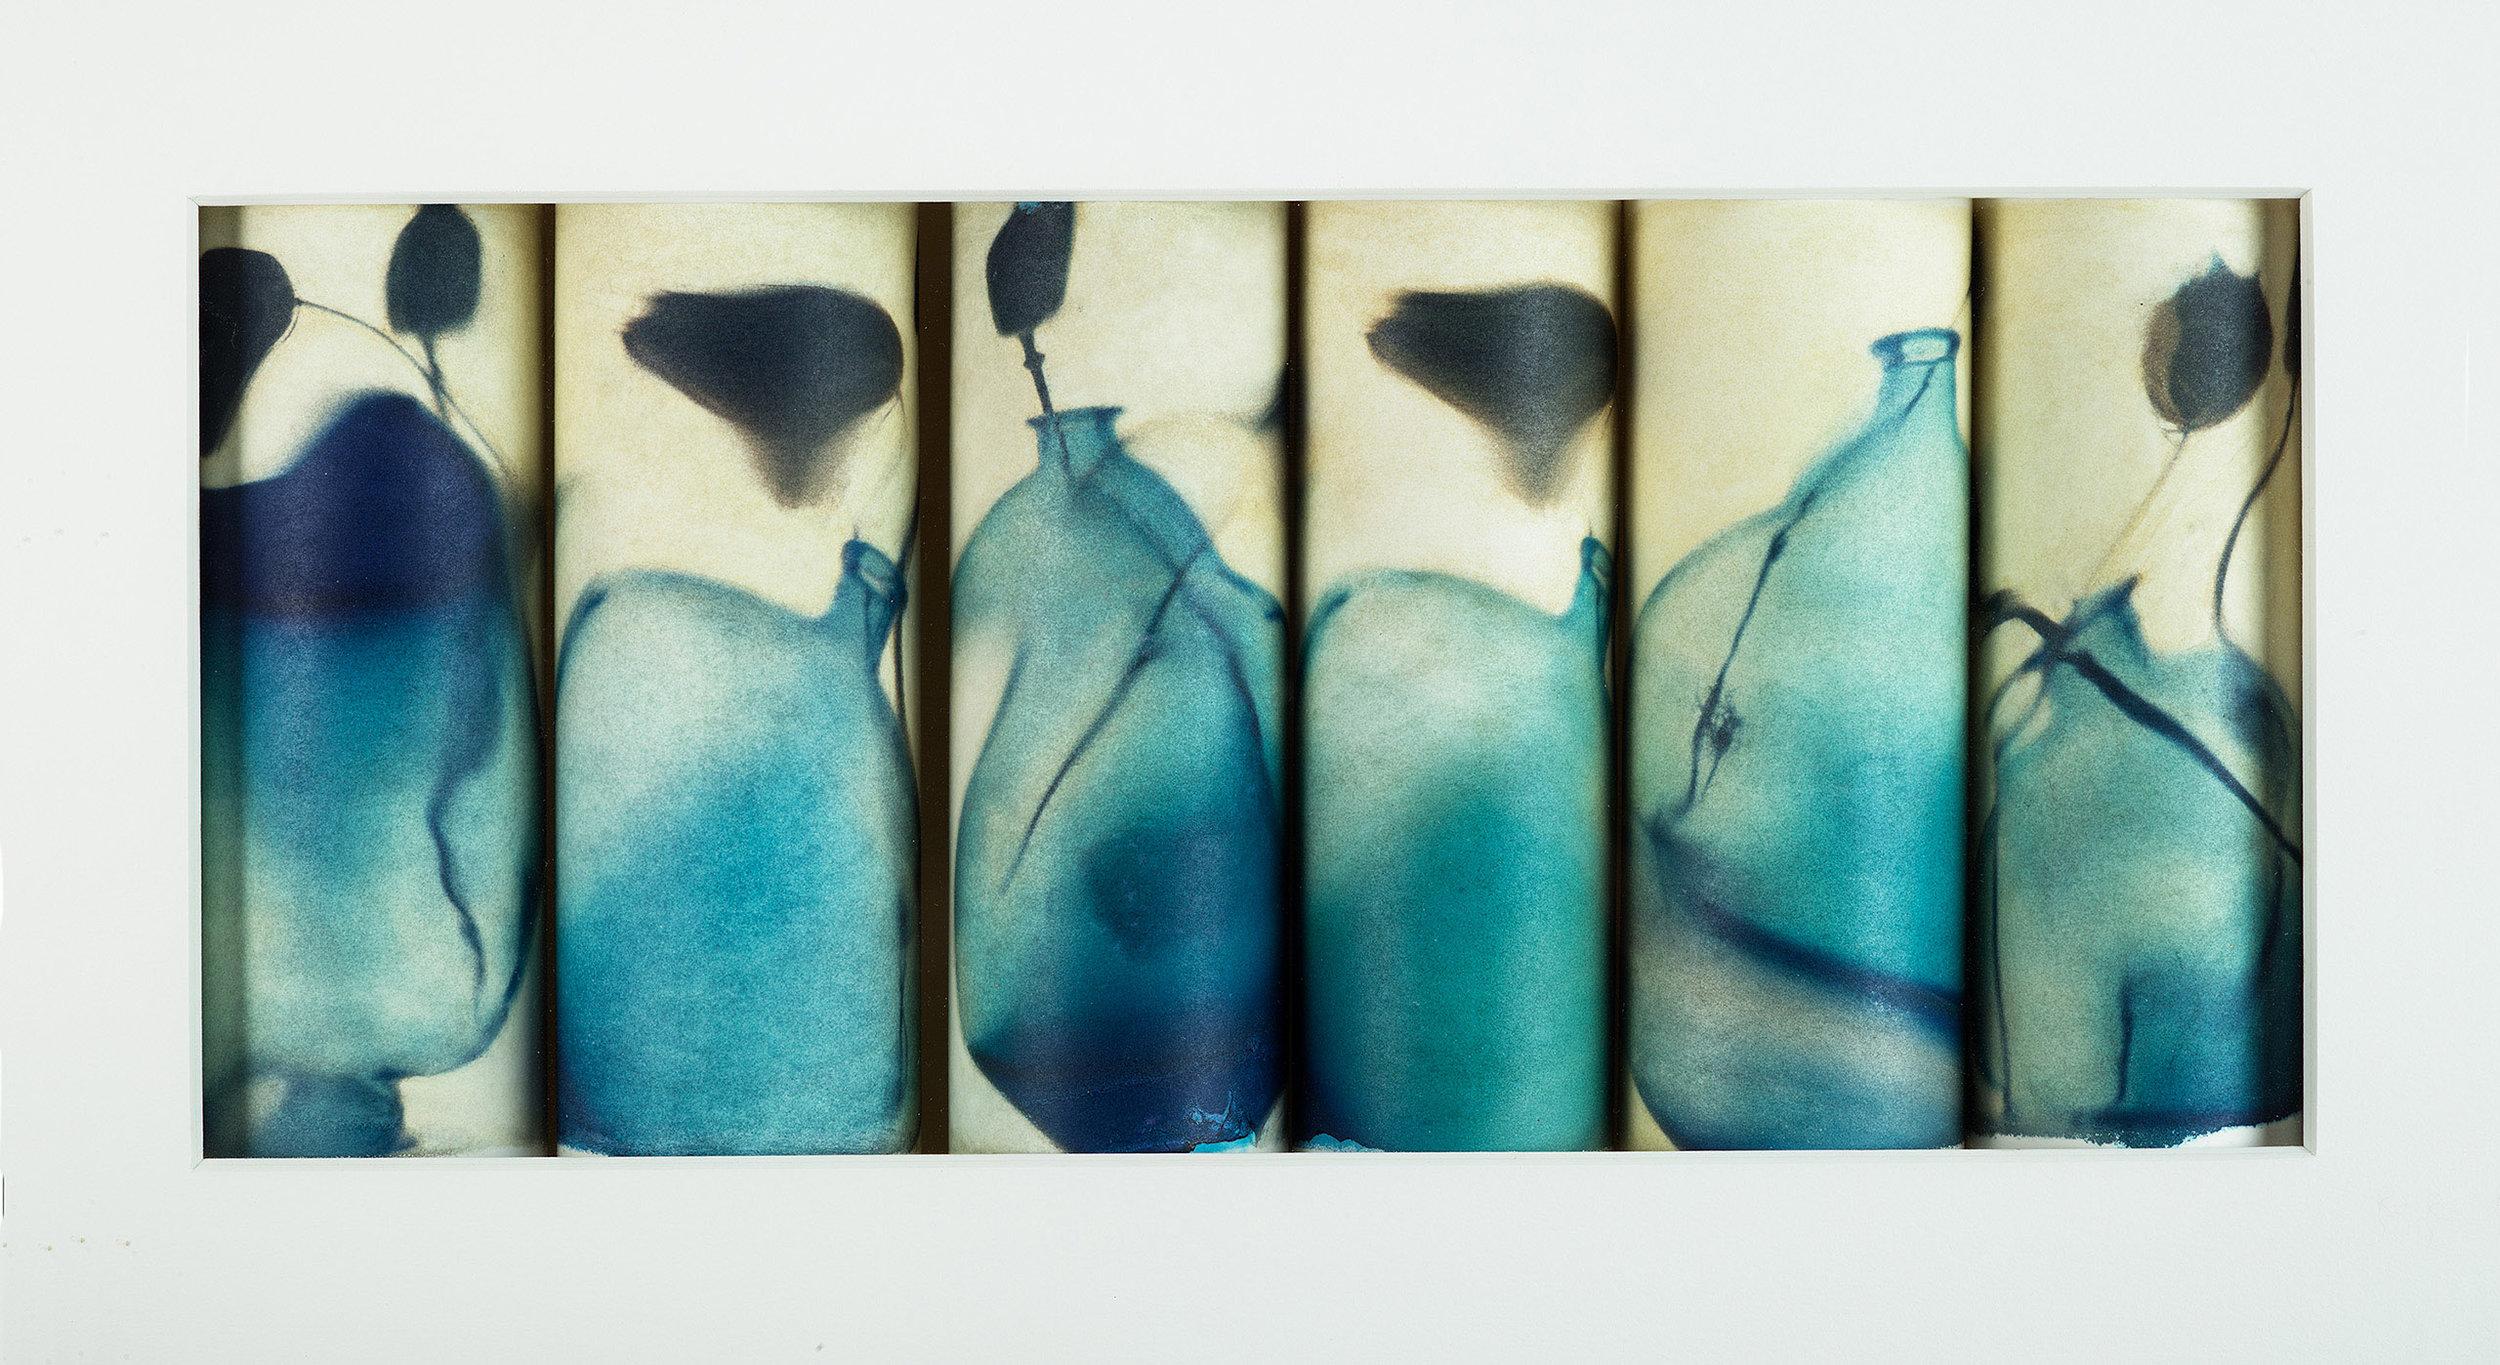 Rolled prints/Polaroid Transfers